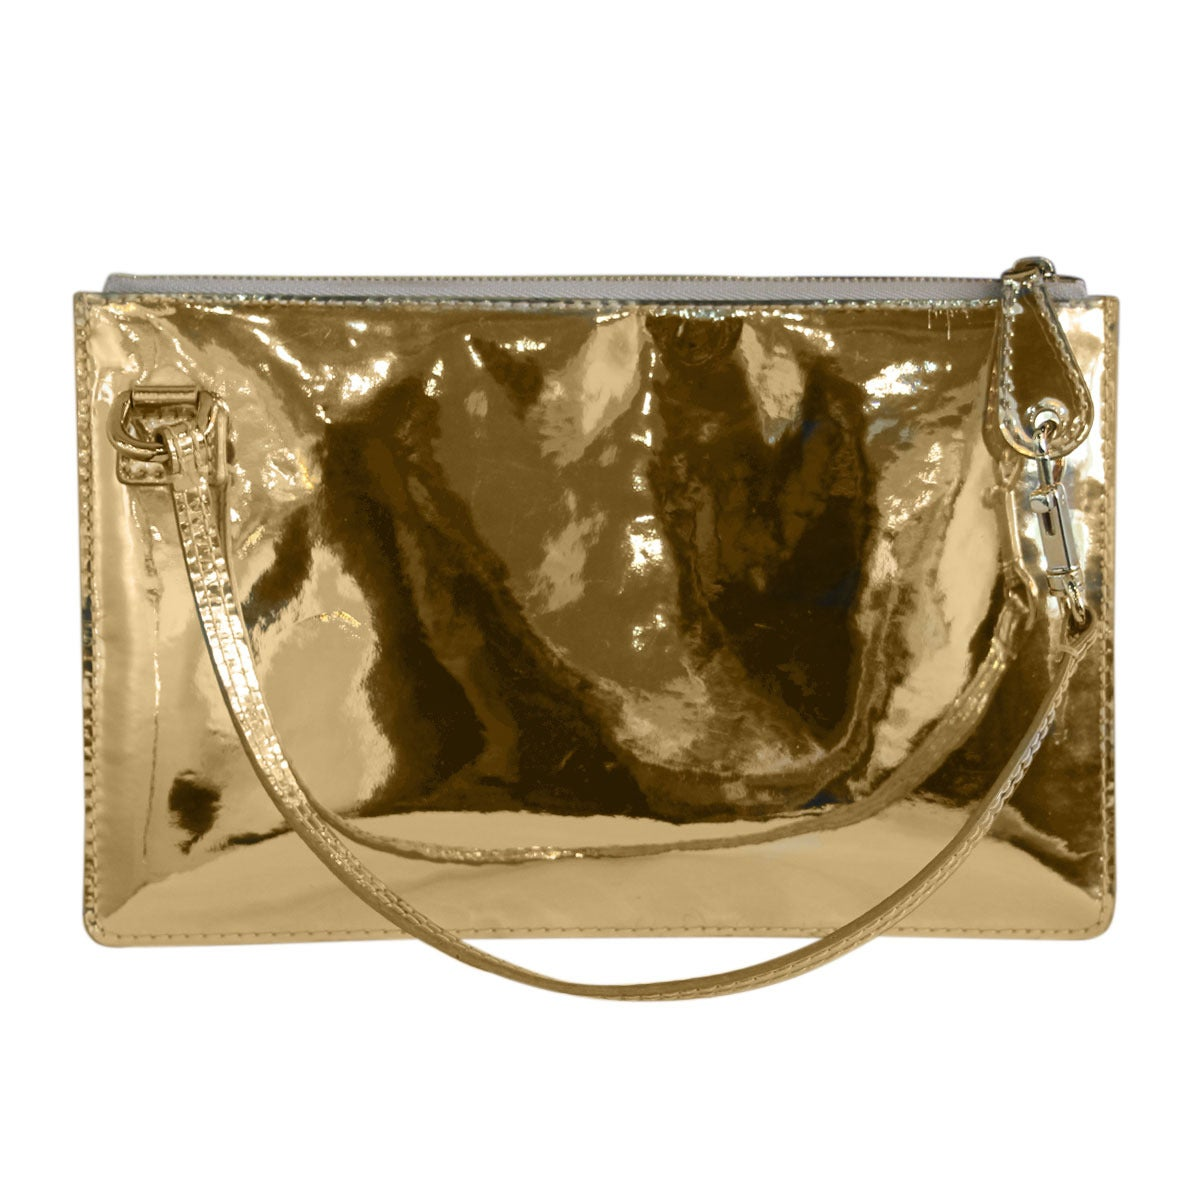 Louis vuitton limited edition gold miroir pochette clutch for Louis vuitton miroir collection